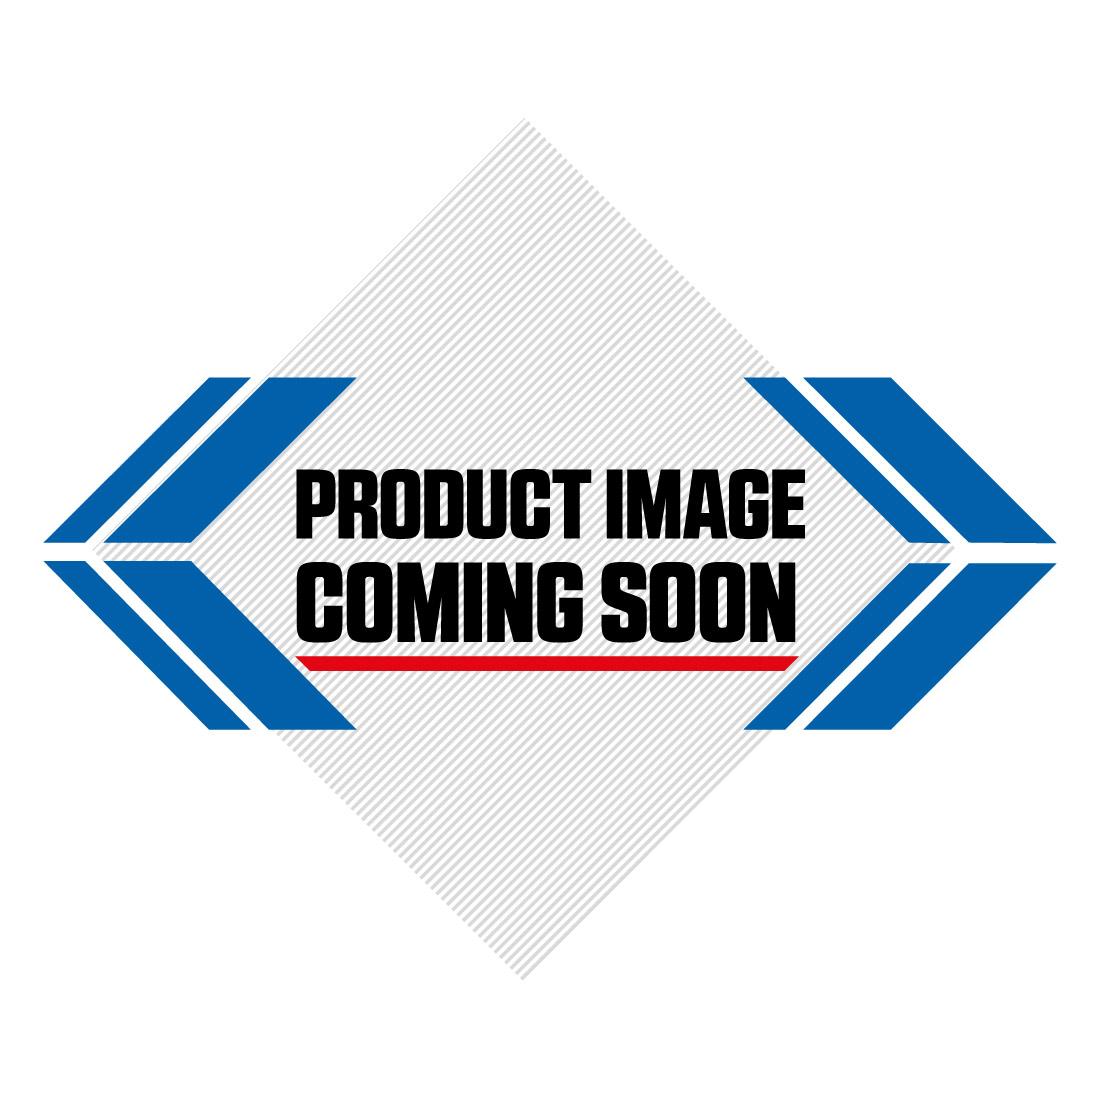 Suzuki Plastic Kit RMZ 450 (2013) OEM Factory Image-2>